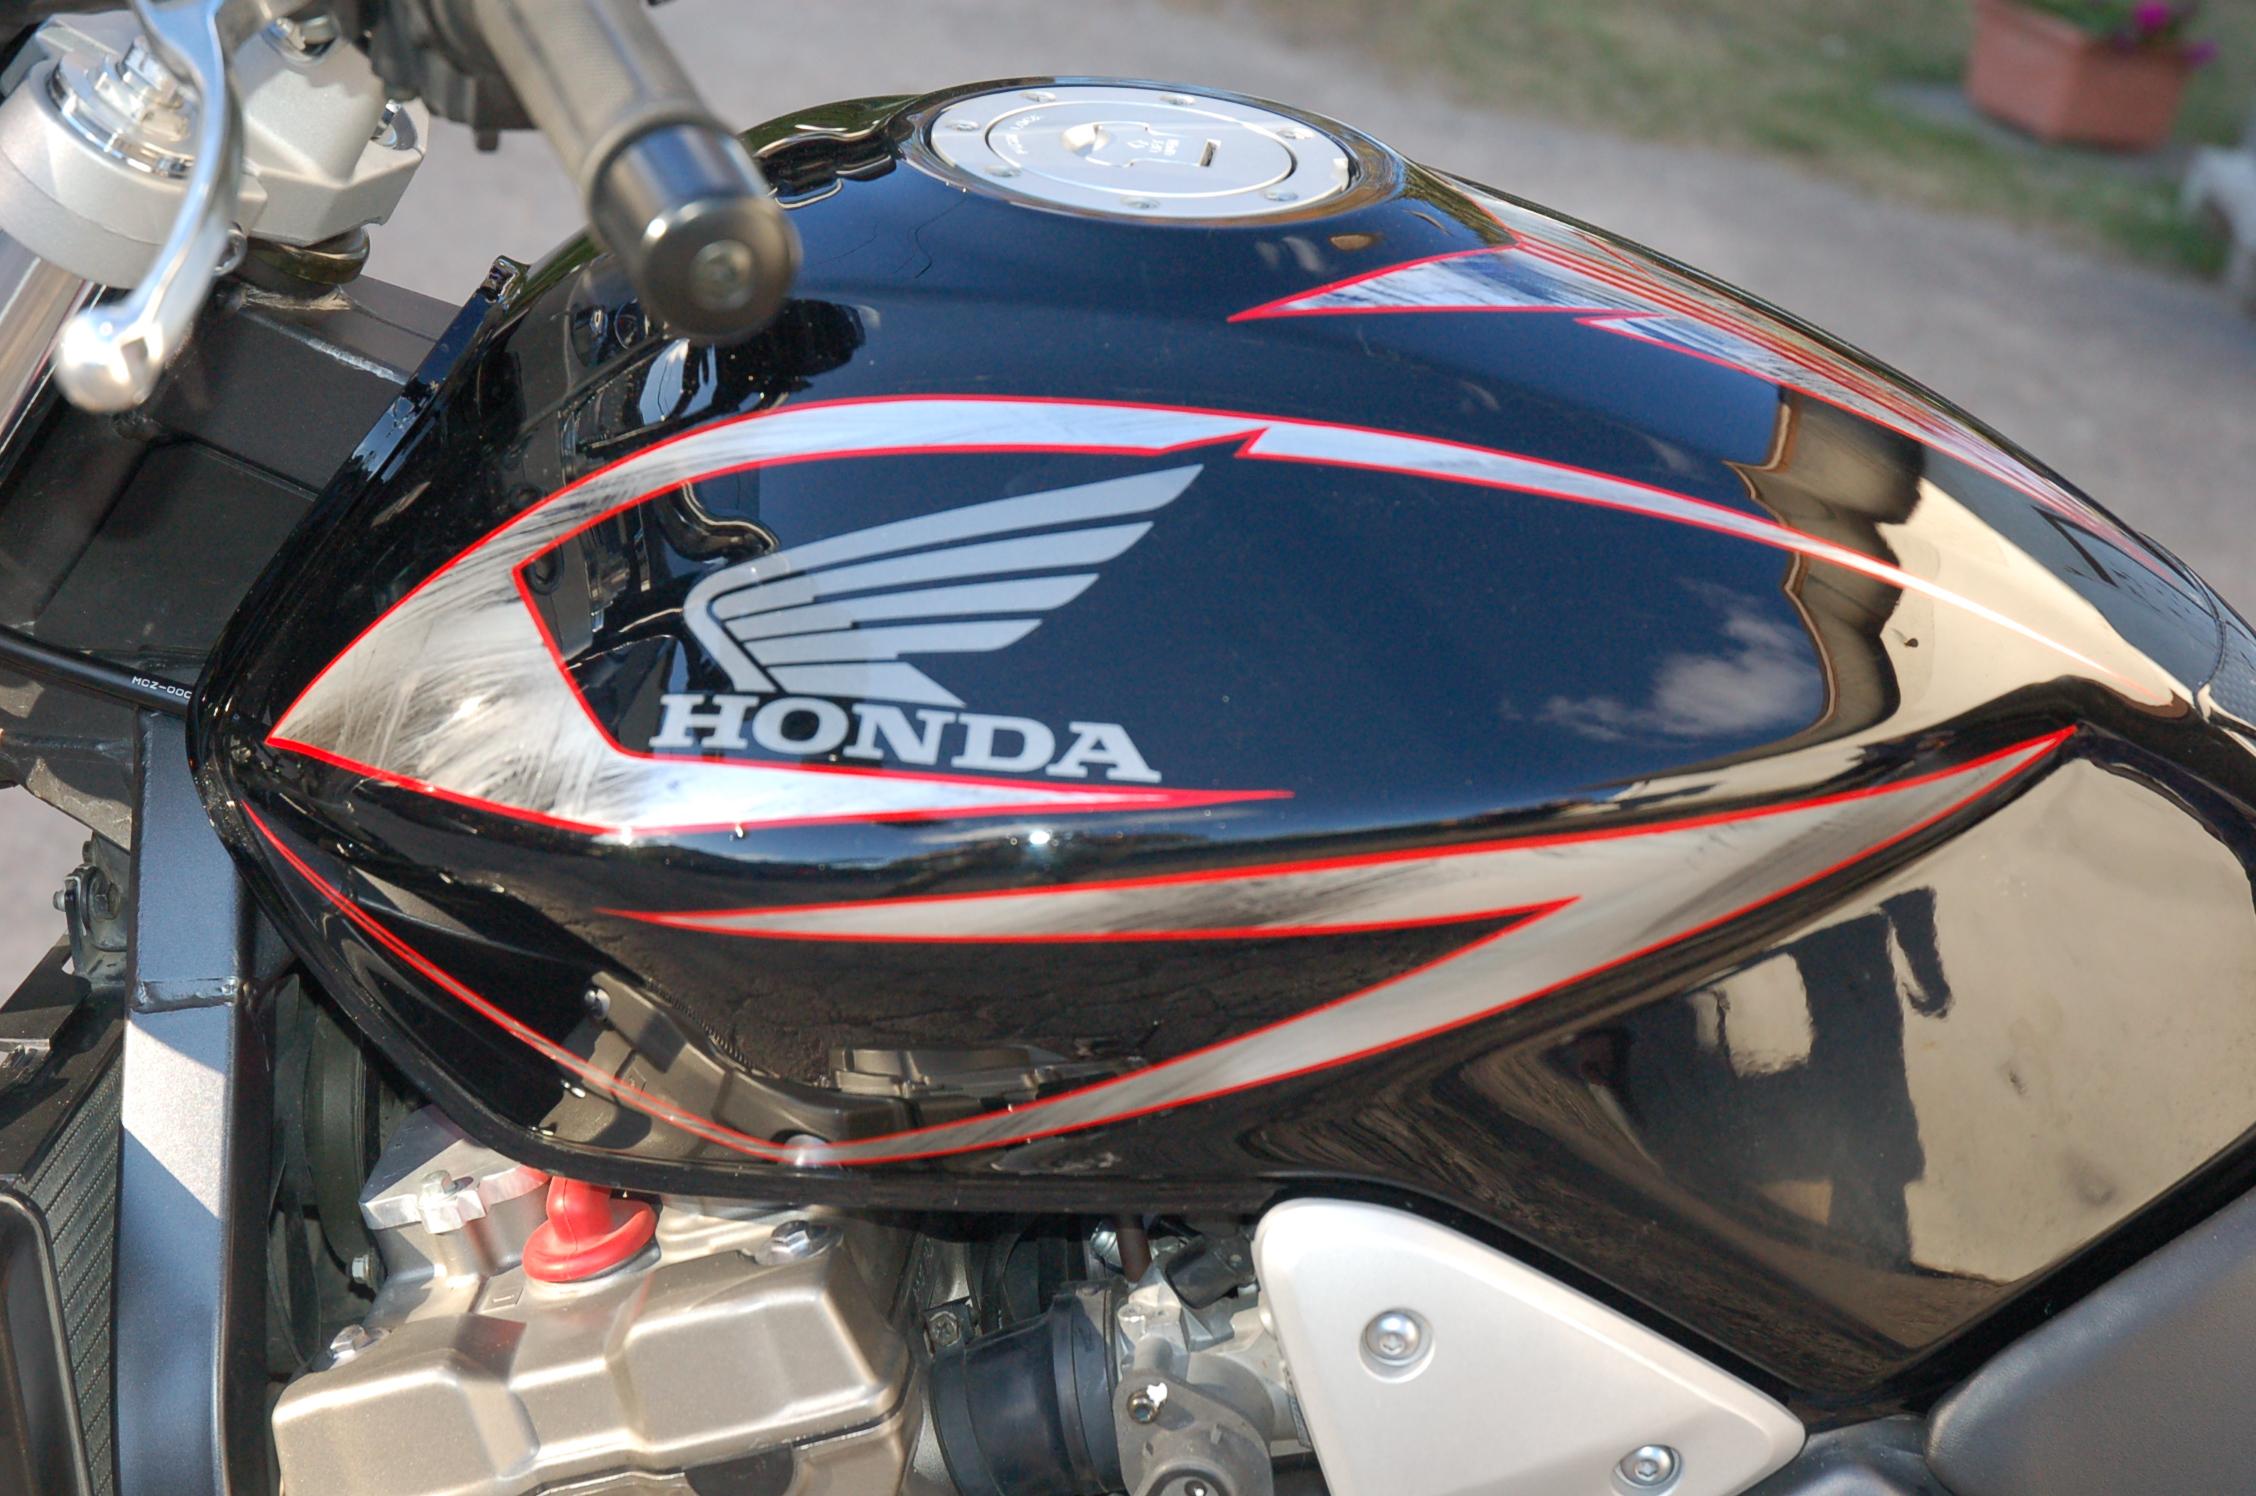 Honda Minigraphics